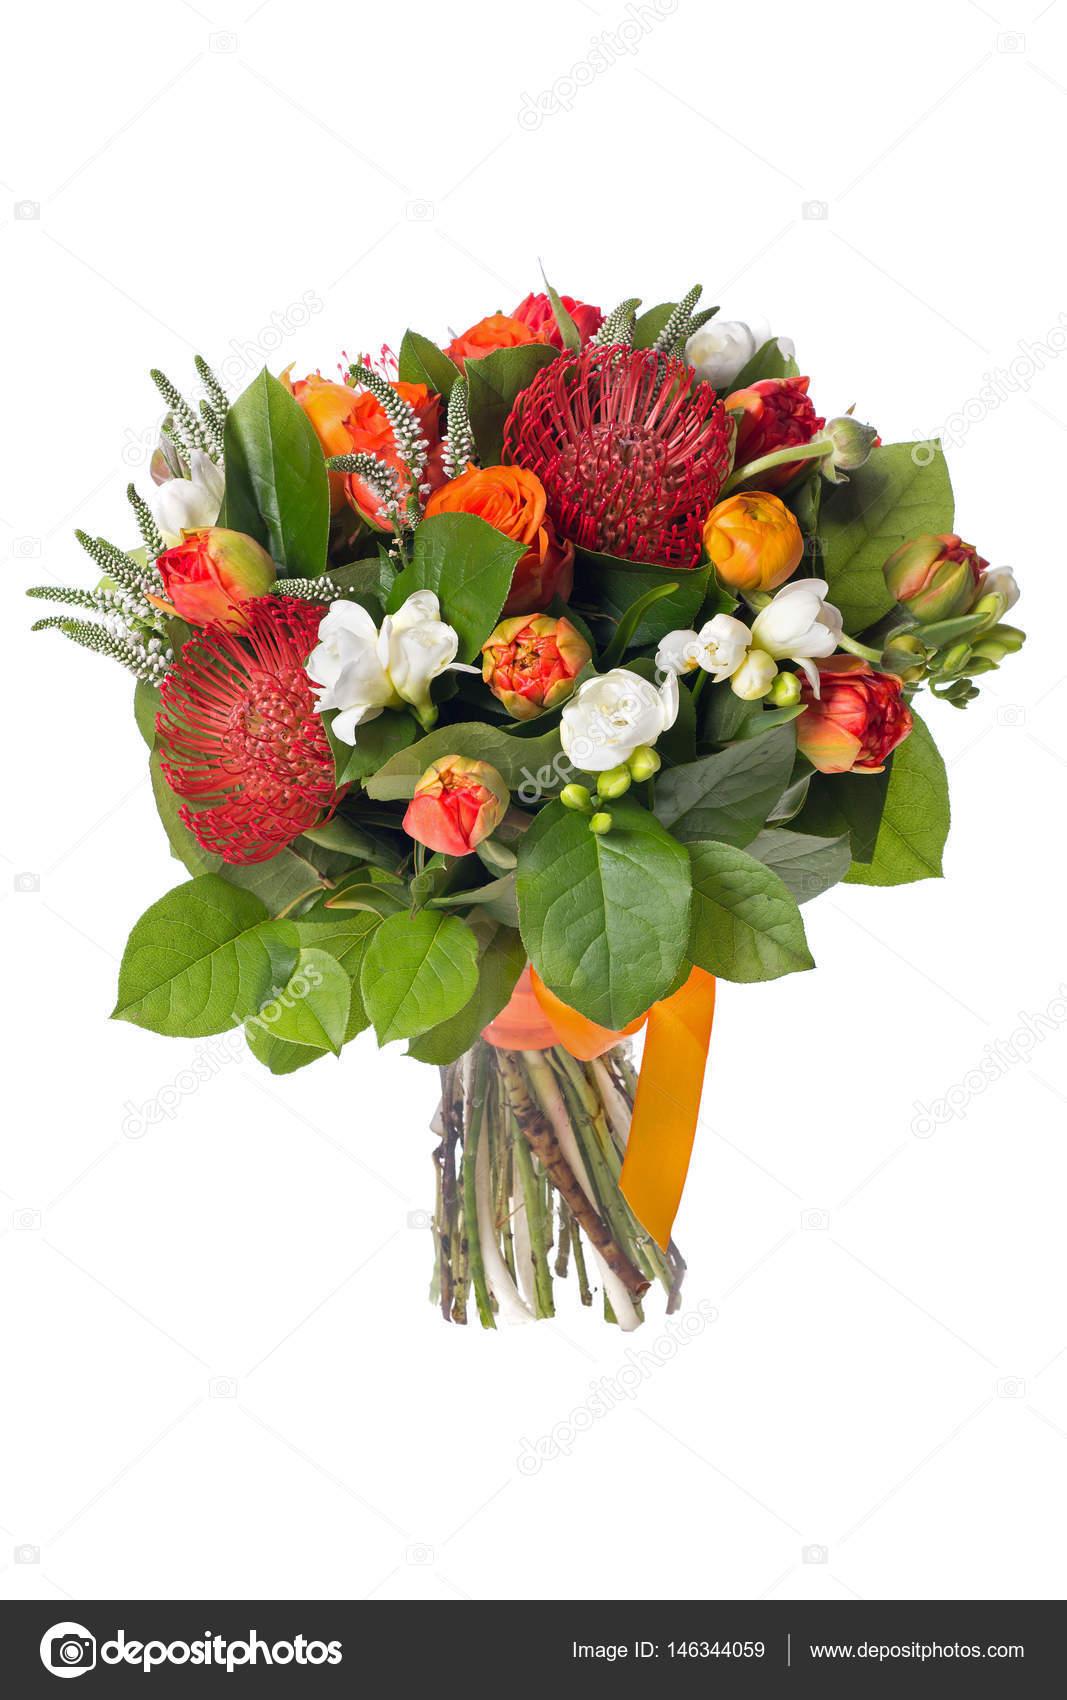 Bellissimo Mazzo Di Fiori.Beautiful Bouquet Of Flowers Stock Photo C Pechatnik1506 146344059